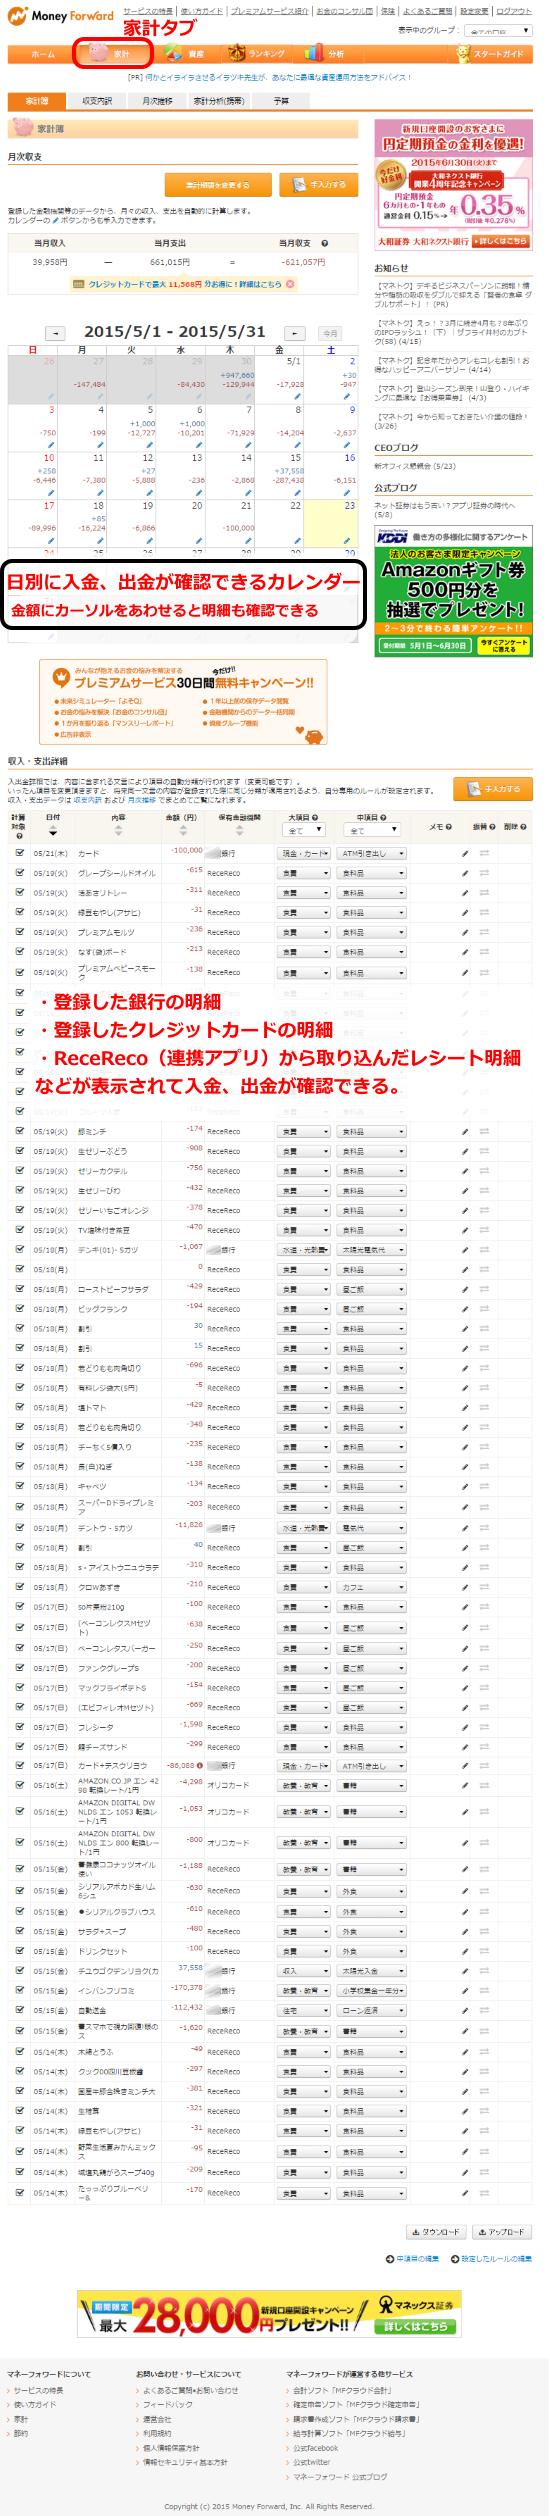 moneyfoward_kakei_top_def1